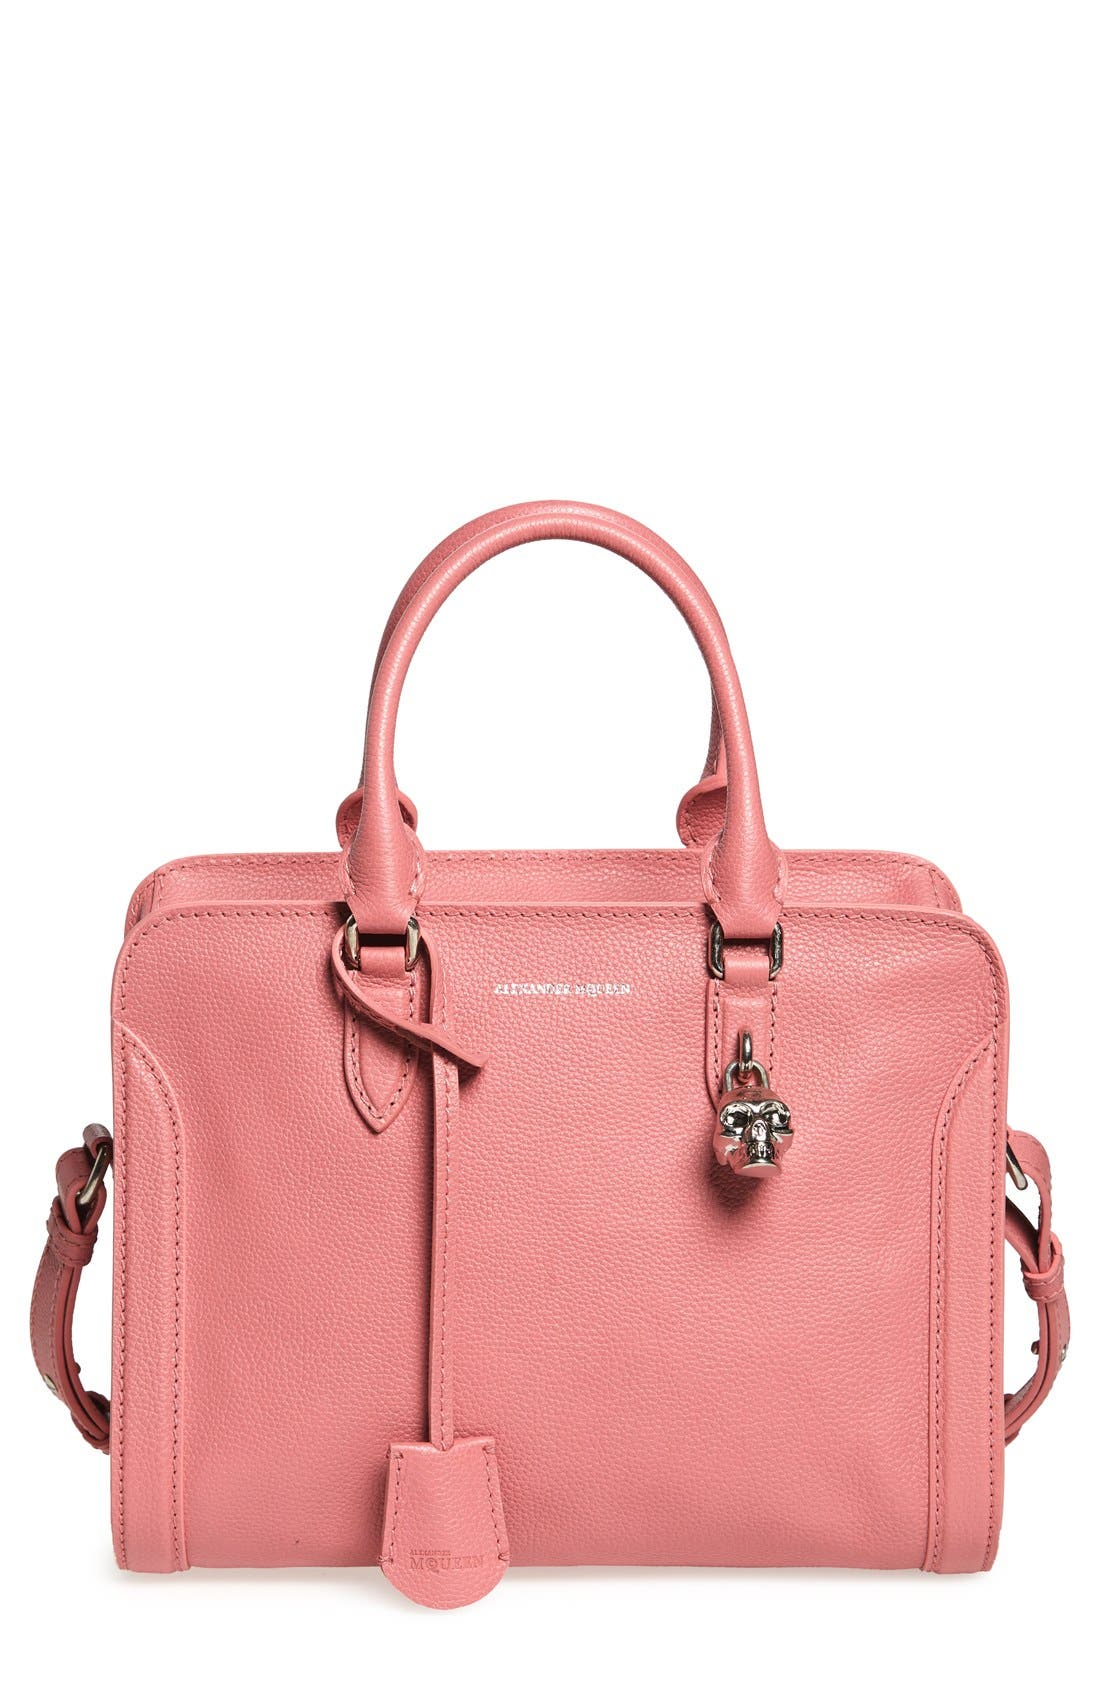 Main Image - Alexander McQueen 'Small Padlock' Leather Duffel Bag